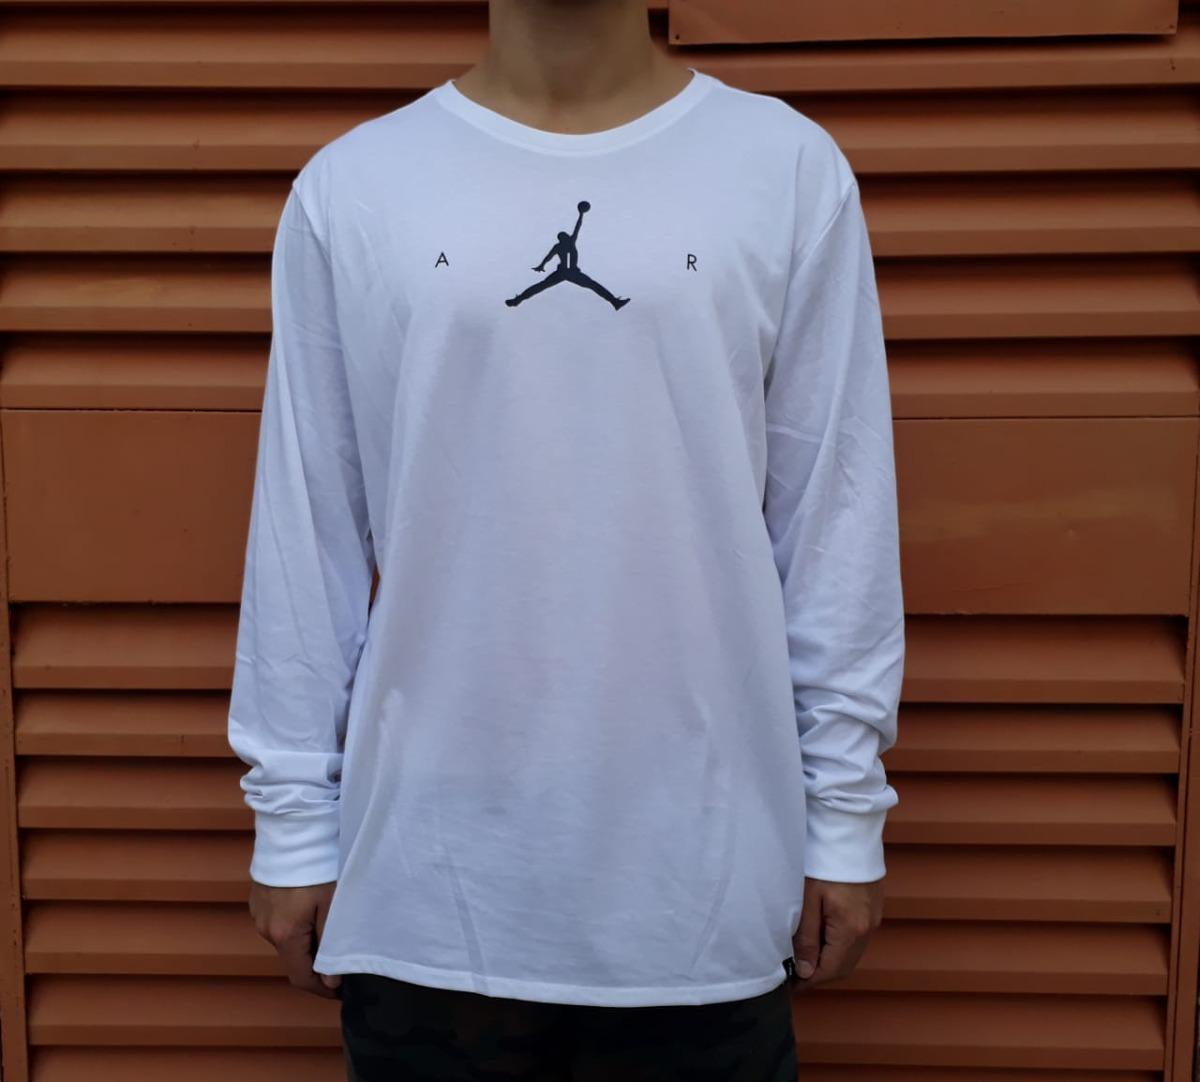 camiseta manga longa nike air jordan jumpman brancooriginal. Carregando  zoom. 54ba558665ab1